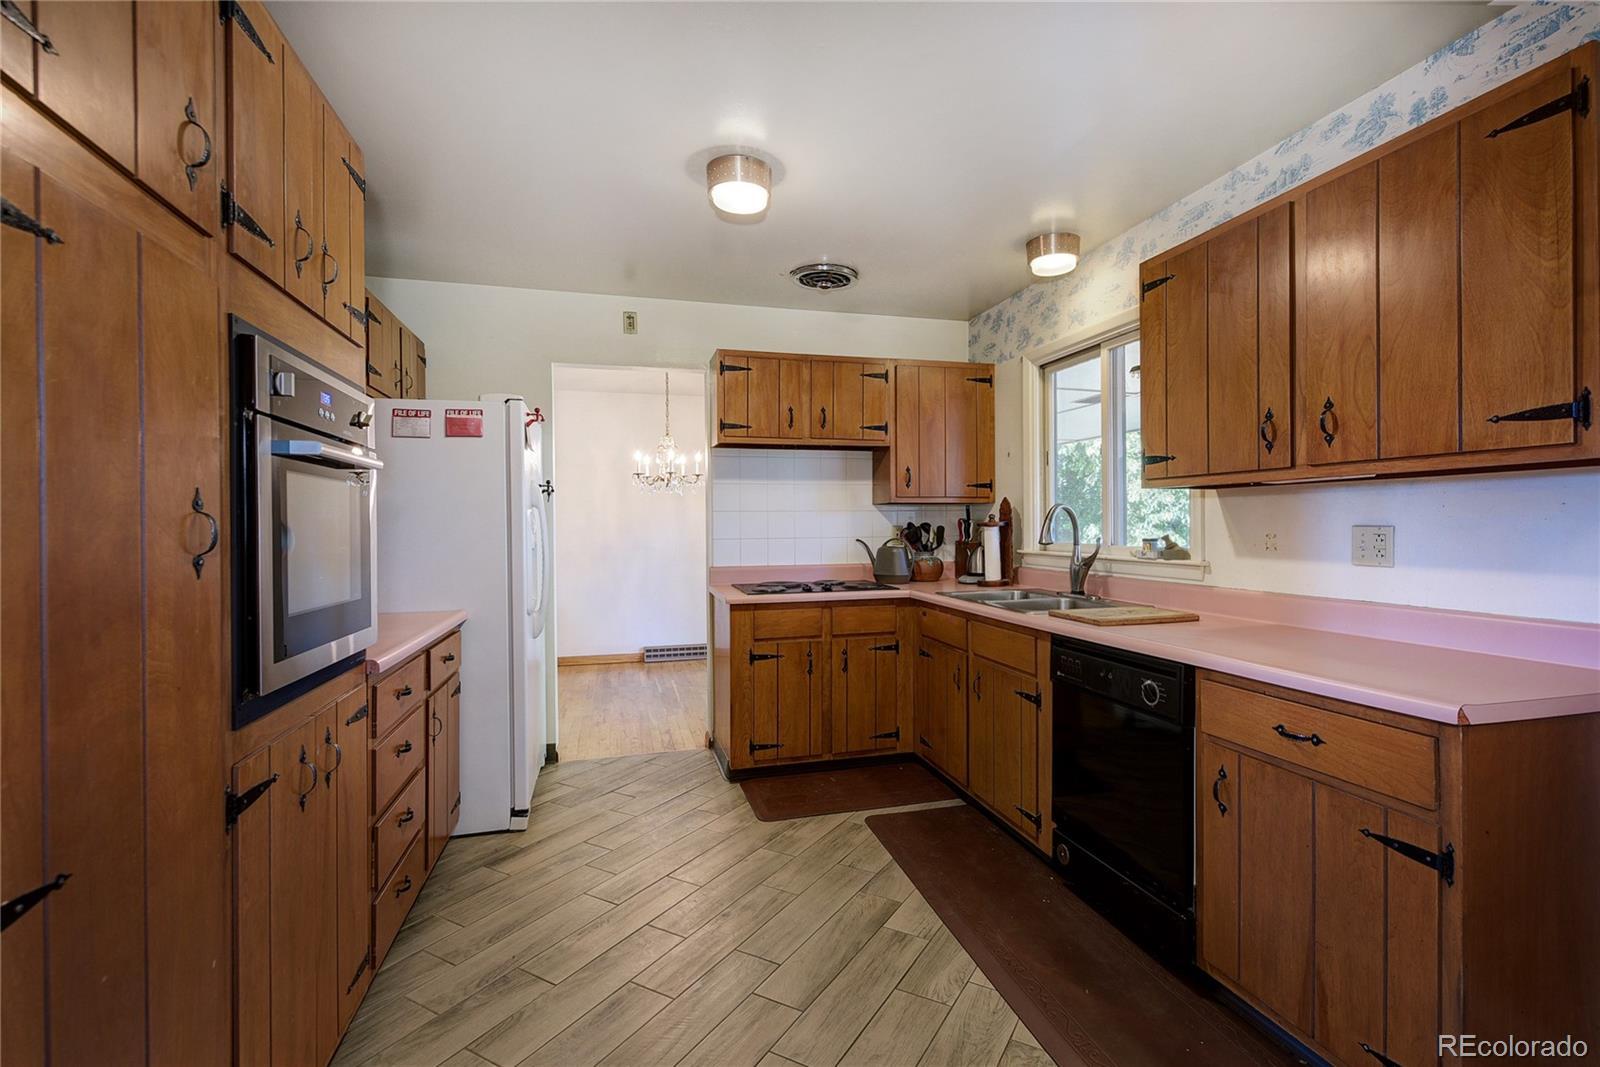 MLS# 3086362 - 18 - 2445 Balsam Drive, Boulder, CO 80304